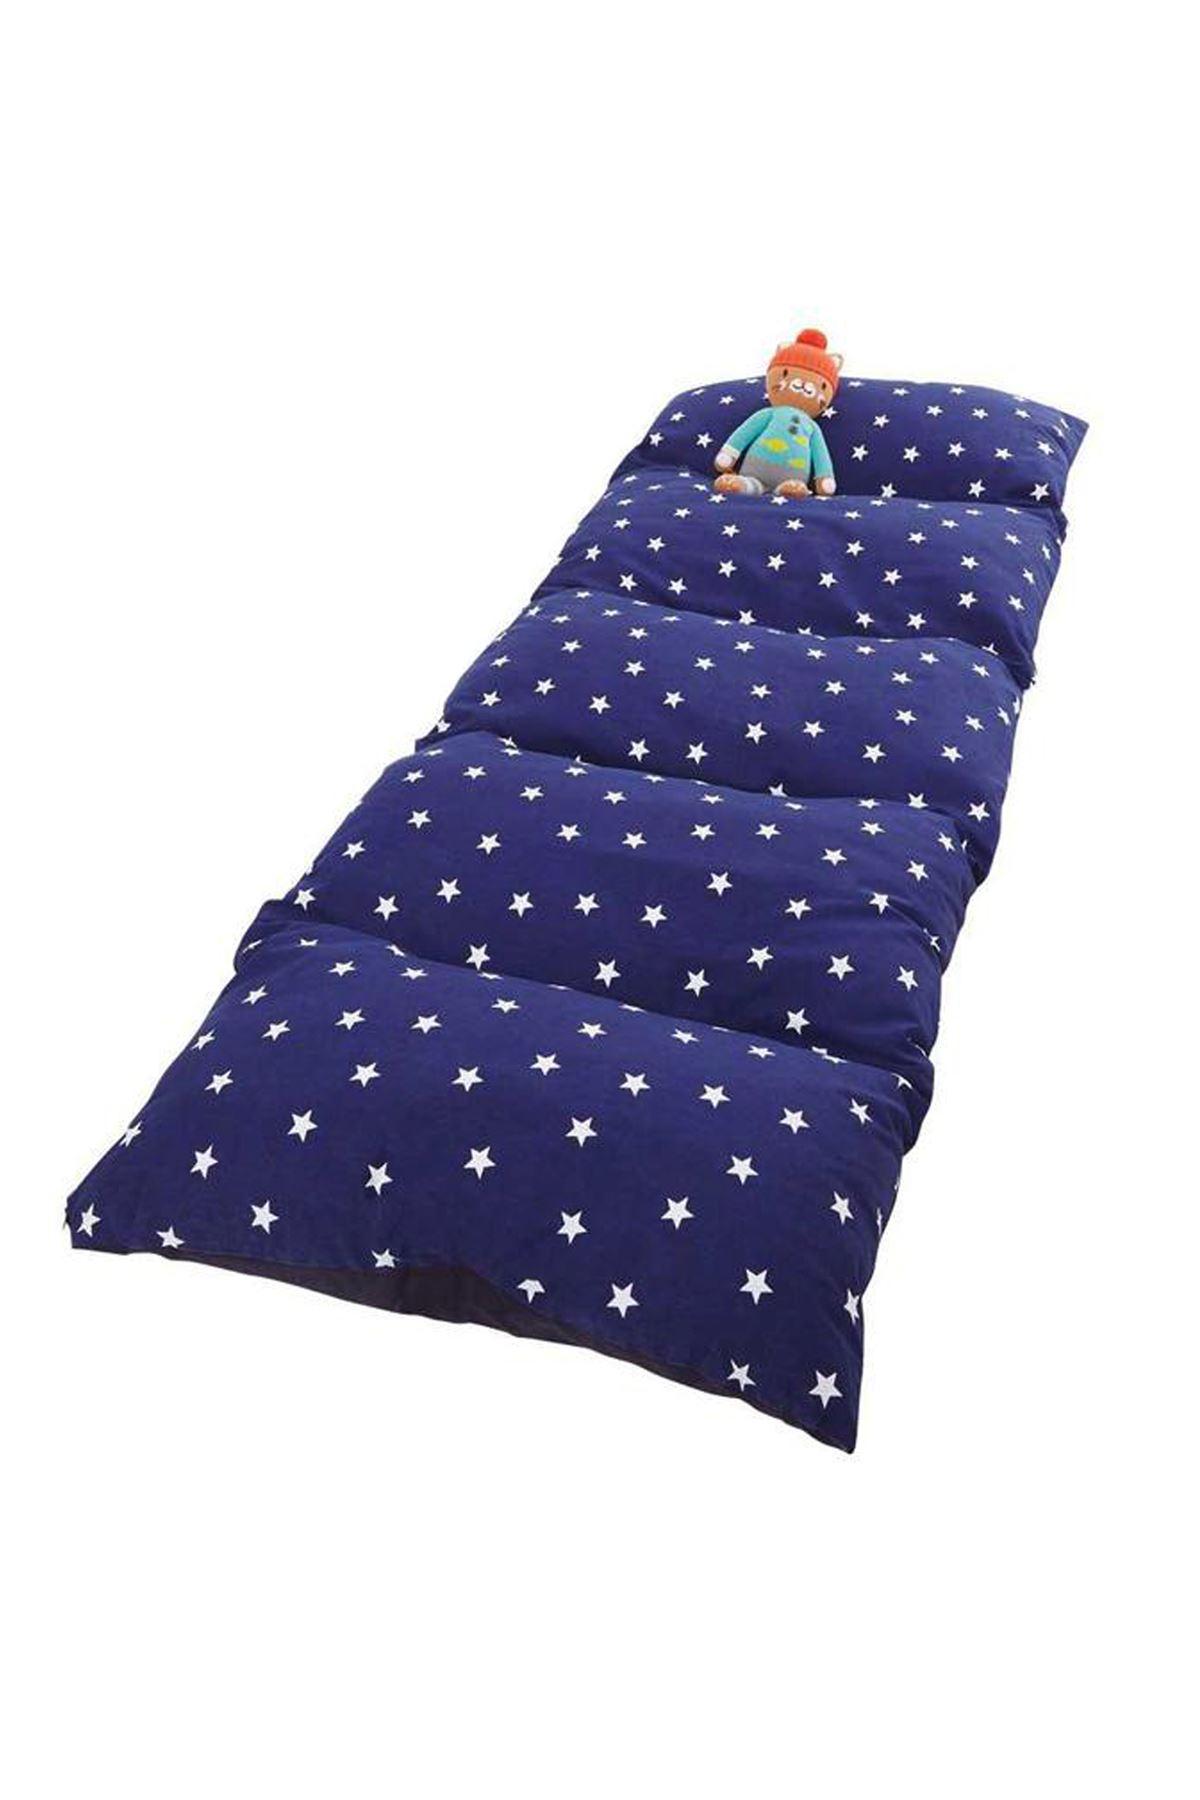 Navy Blue Bundera Pouf Foldable Floor Cushion Pillow Kids Baby Floor Bed